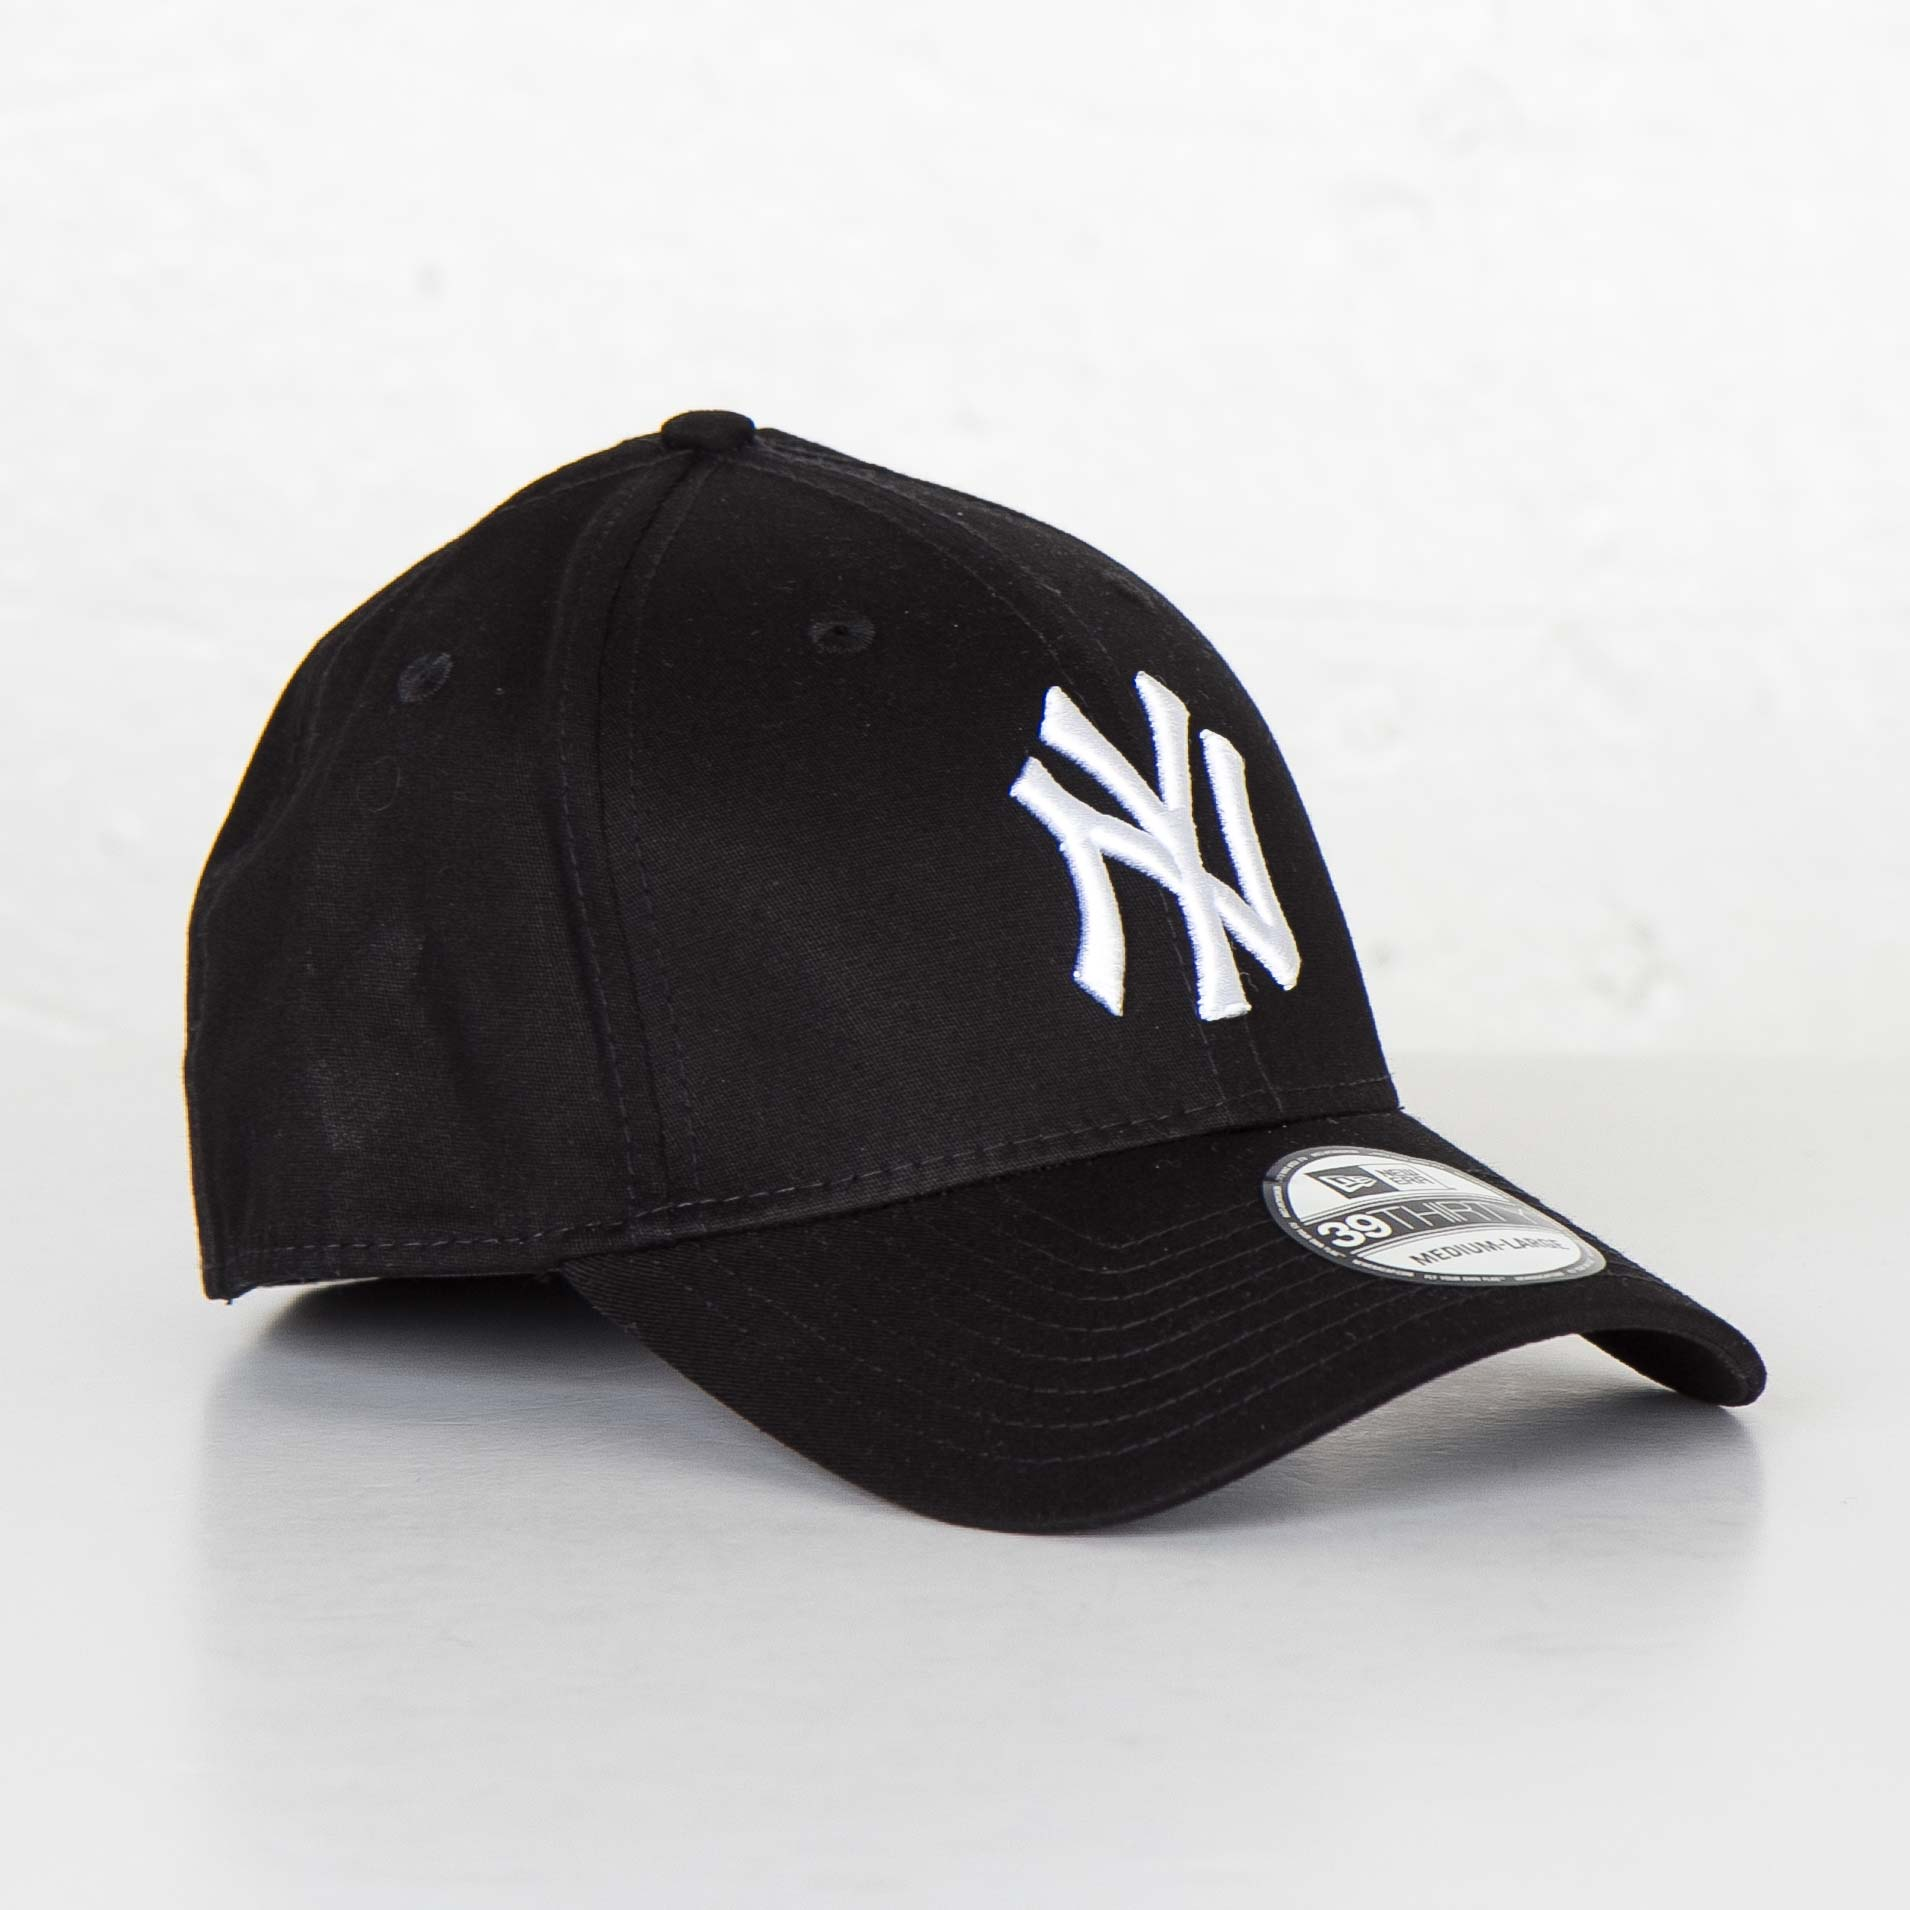 New Era 39Thirty League Basic New York Yankees - 10145638-006 ... 1c22a42ebed